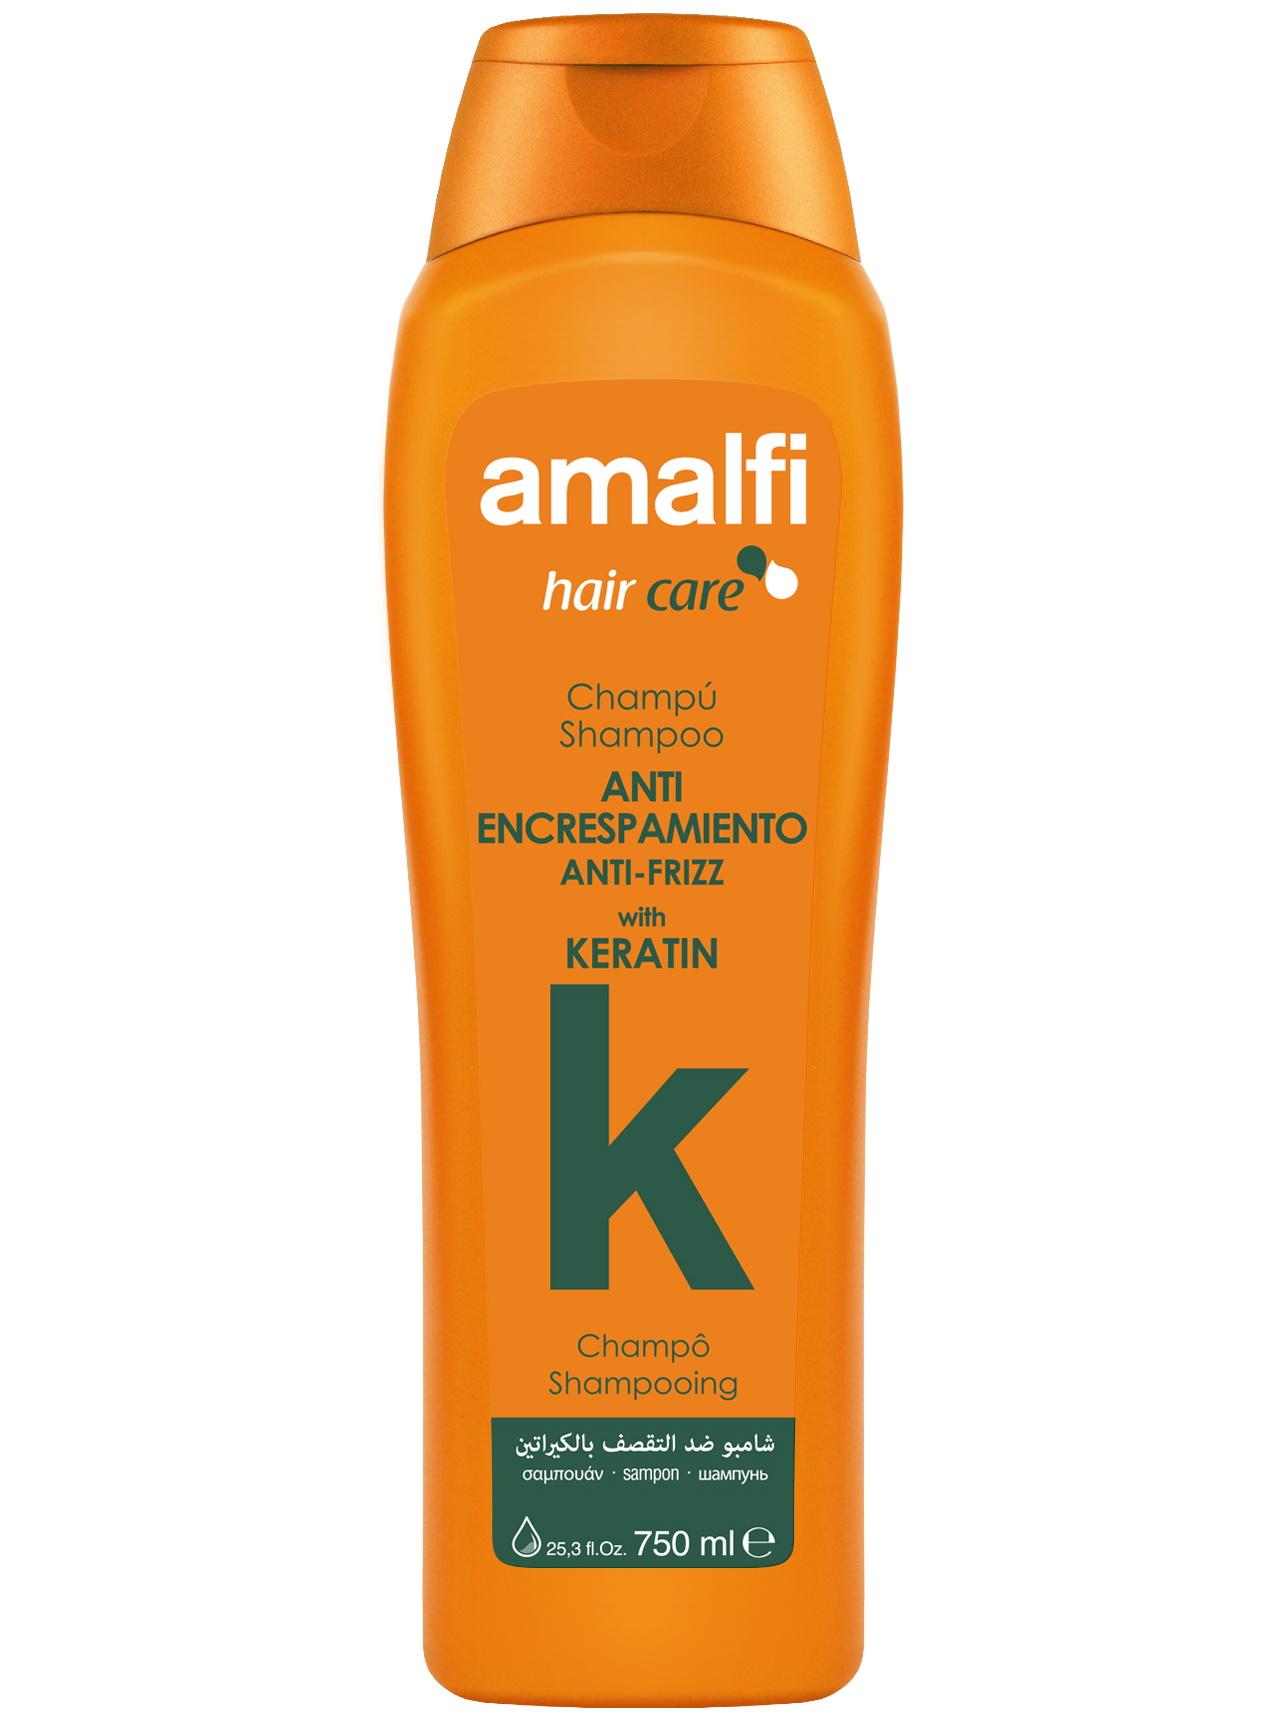 Купить Шампунь для ухода за волосами AMALFI с кератином anti-frizz 750 мл, Amalfy